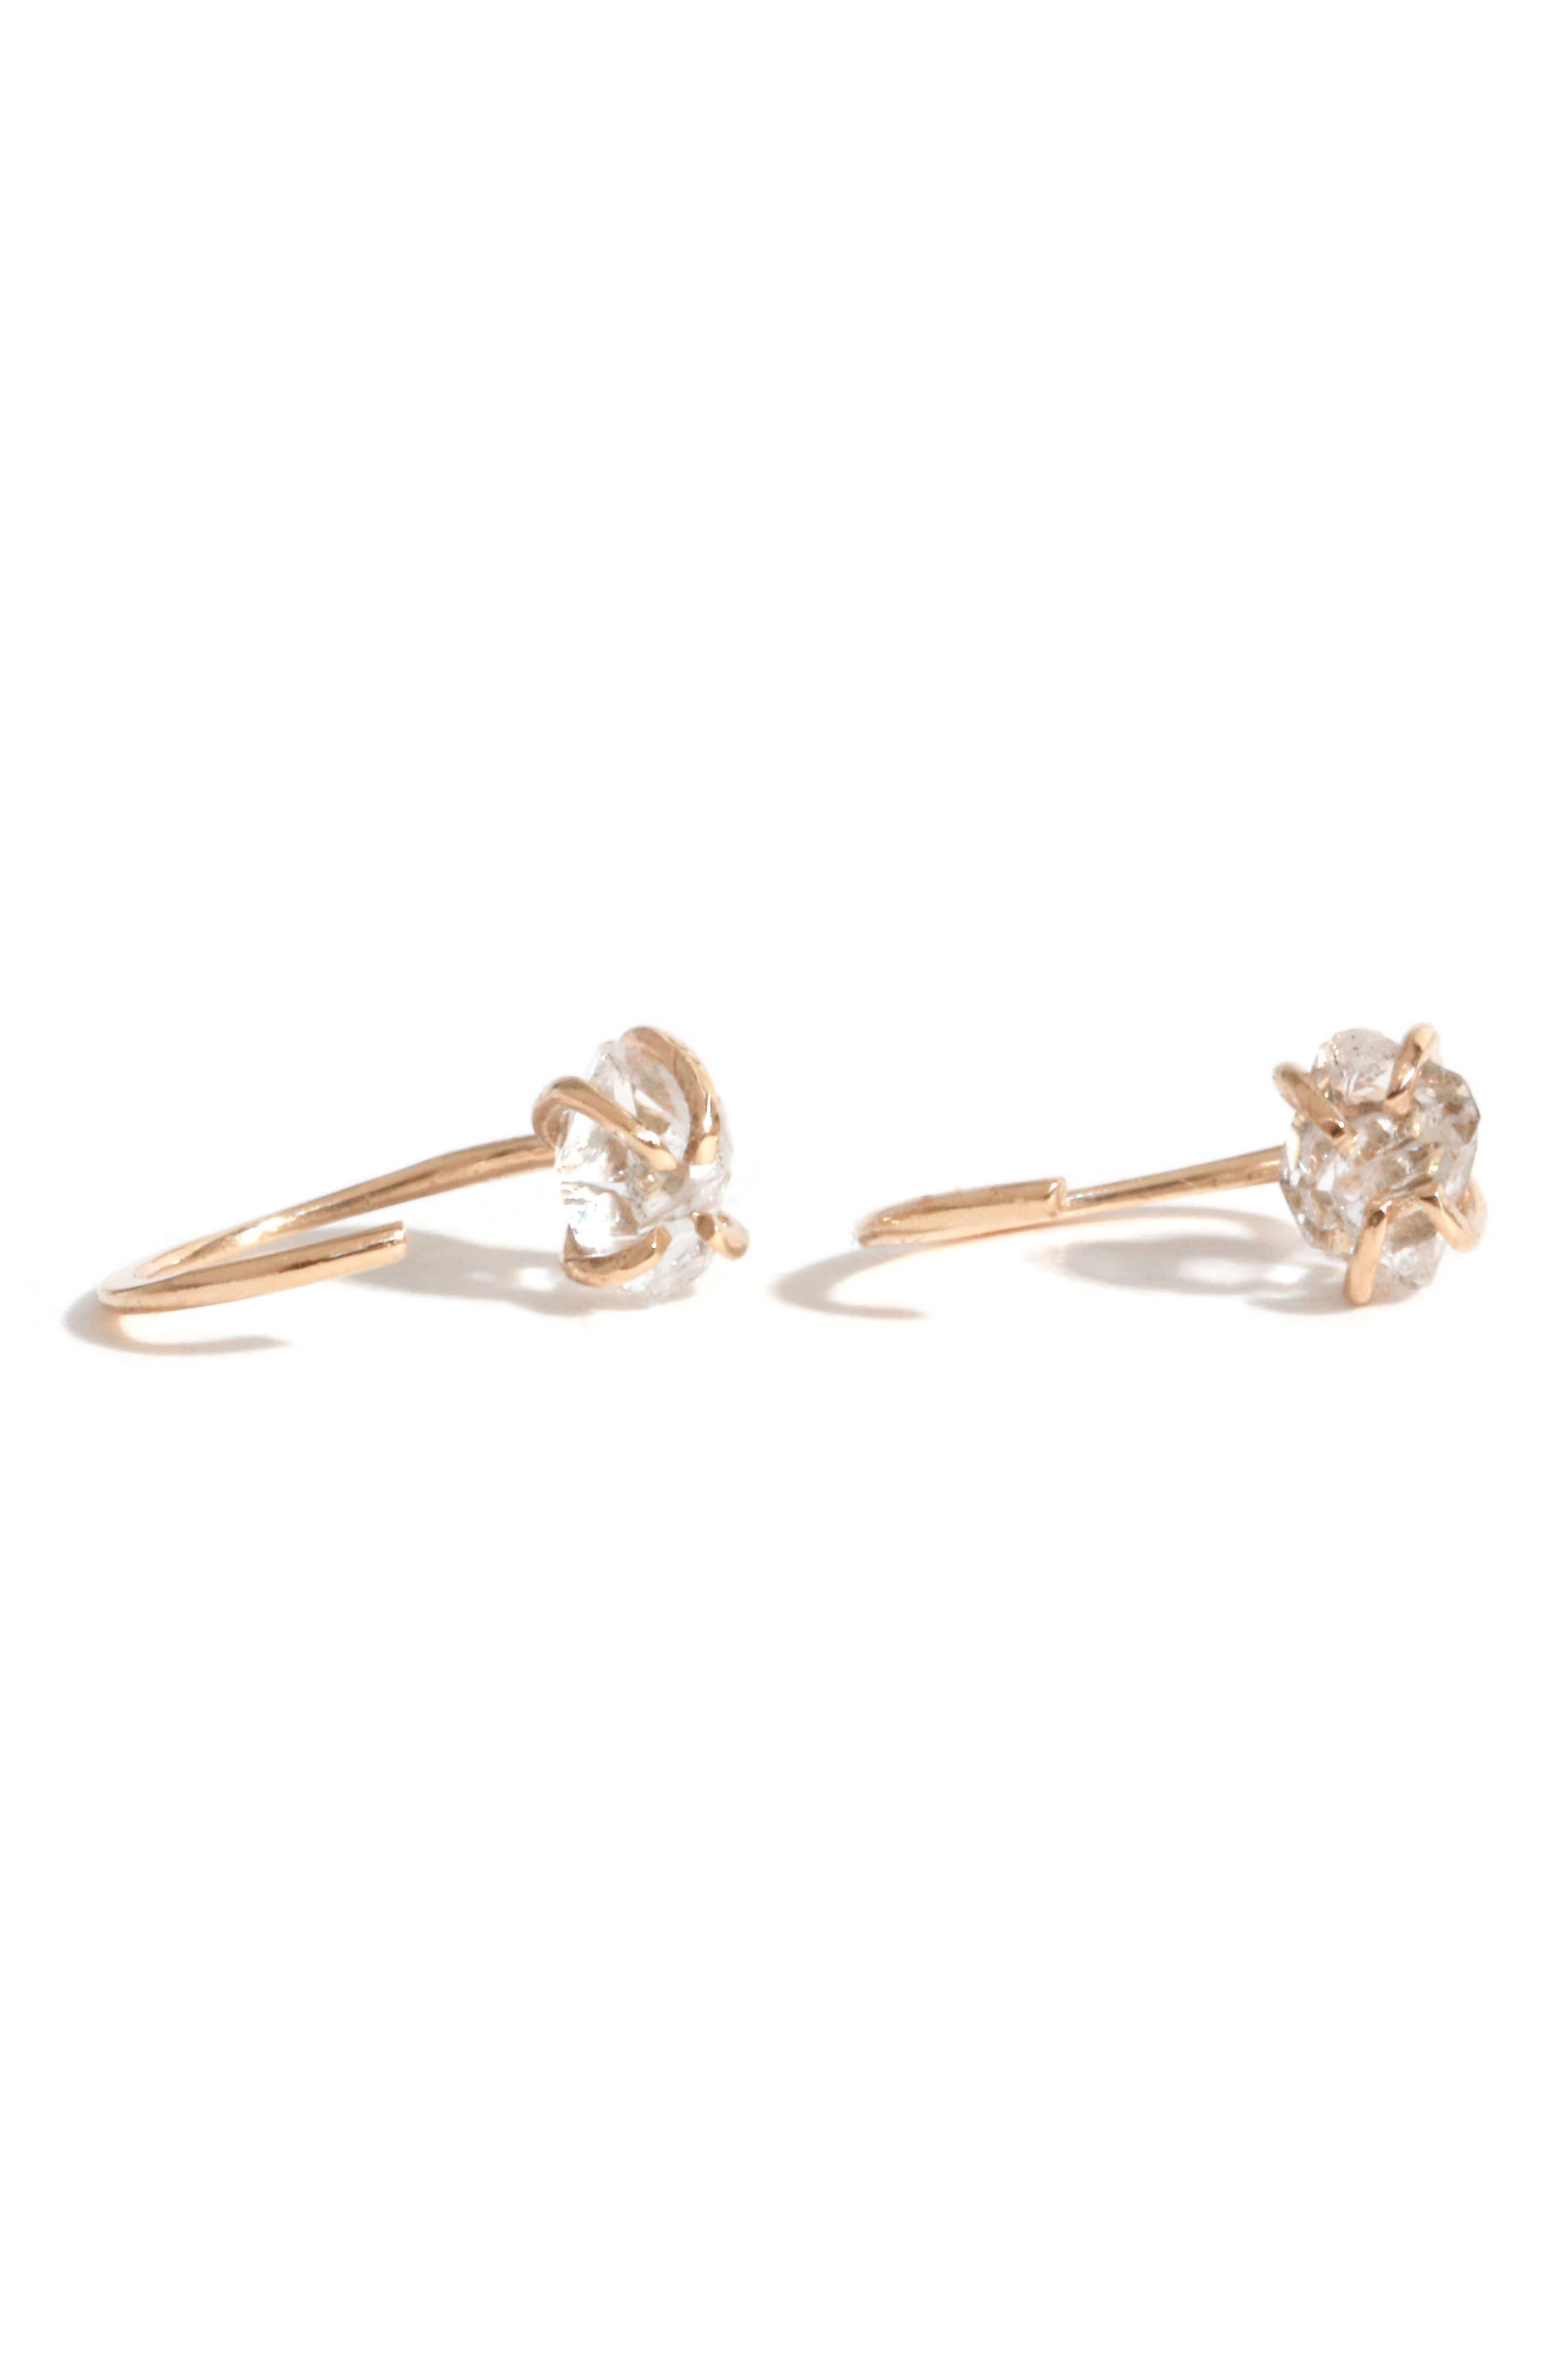 Hug Hoop Crystal Earrings,                             Main thumbnail 1, color,                             Yellow Gold